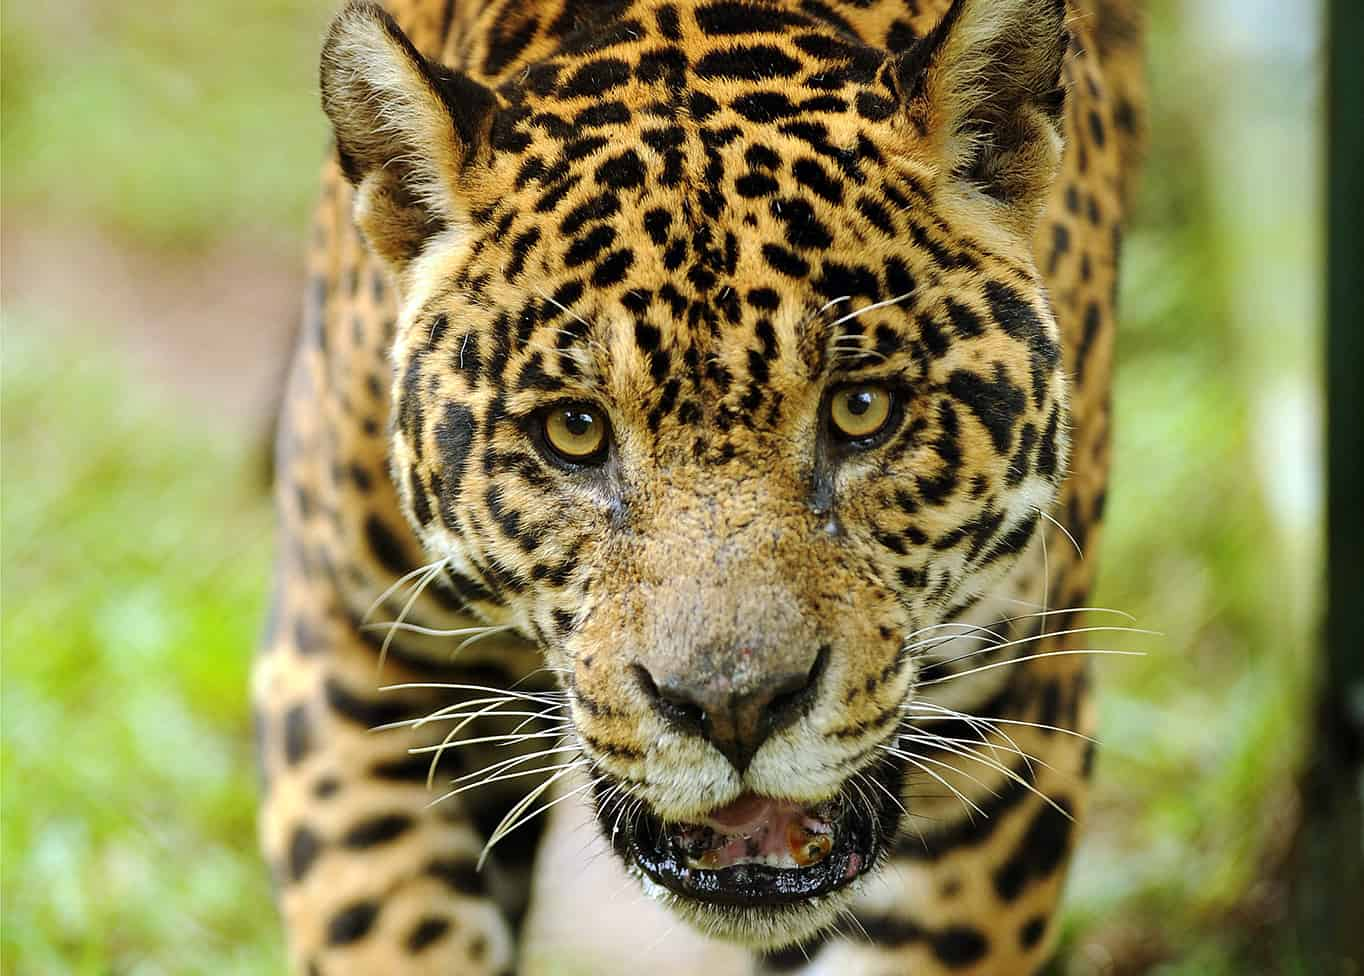 Jaguars A Symbol Of Costa Rica The Tico Times Costa Rica News